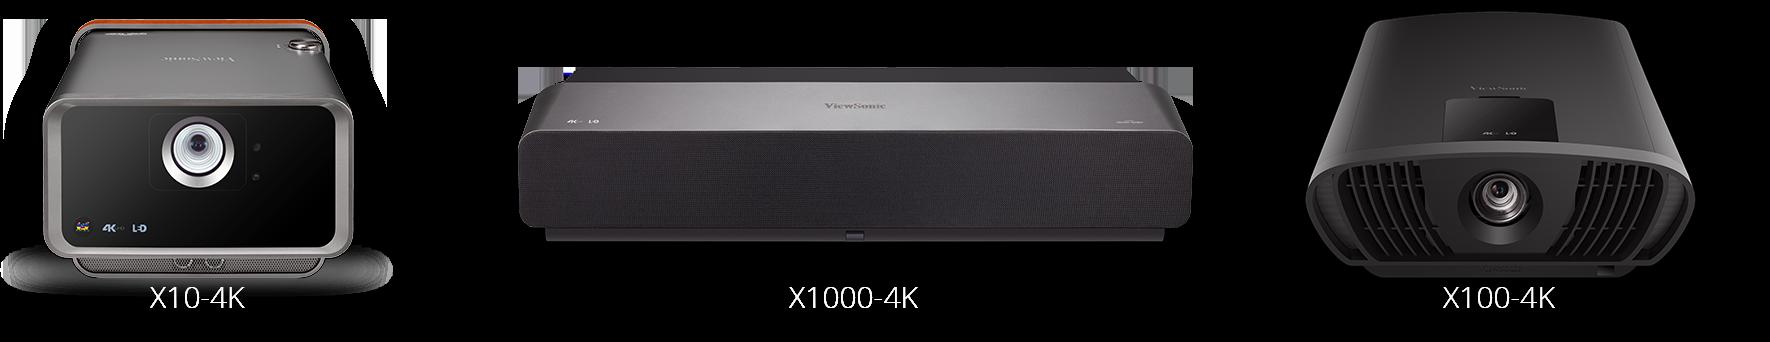 Viewsonic series X